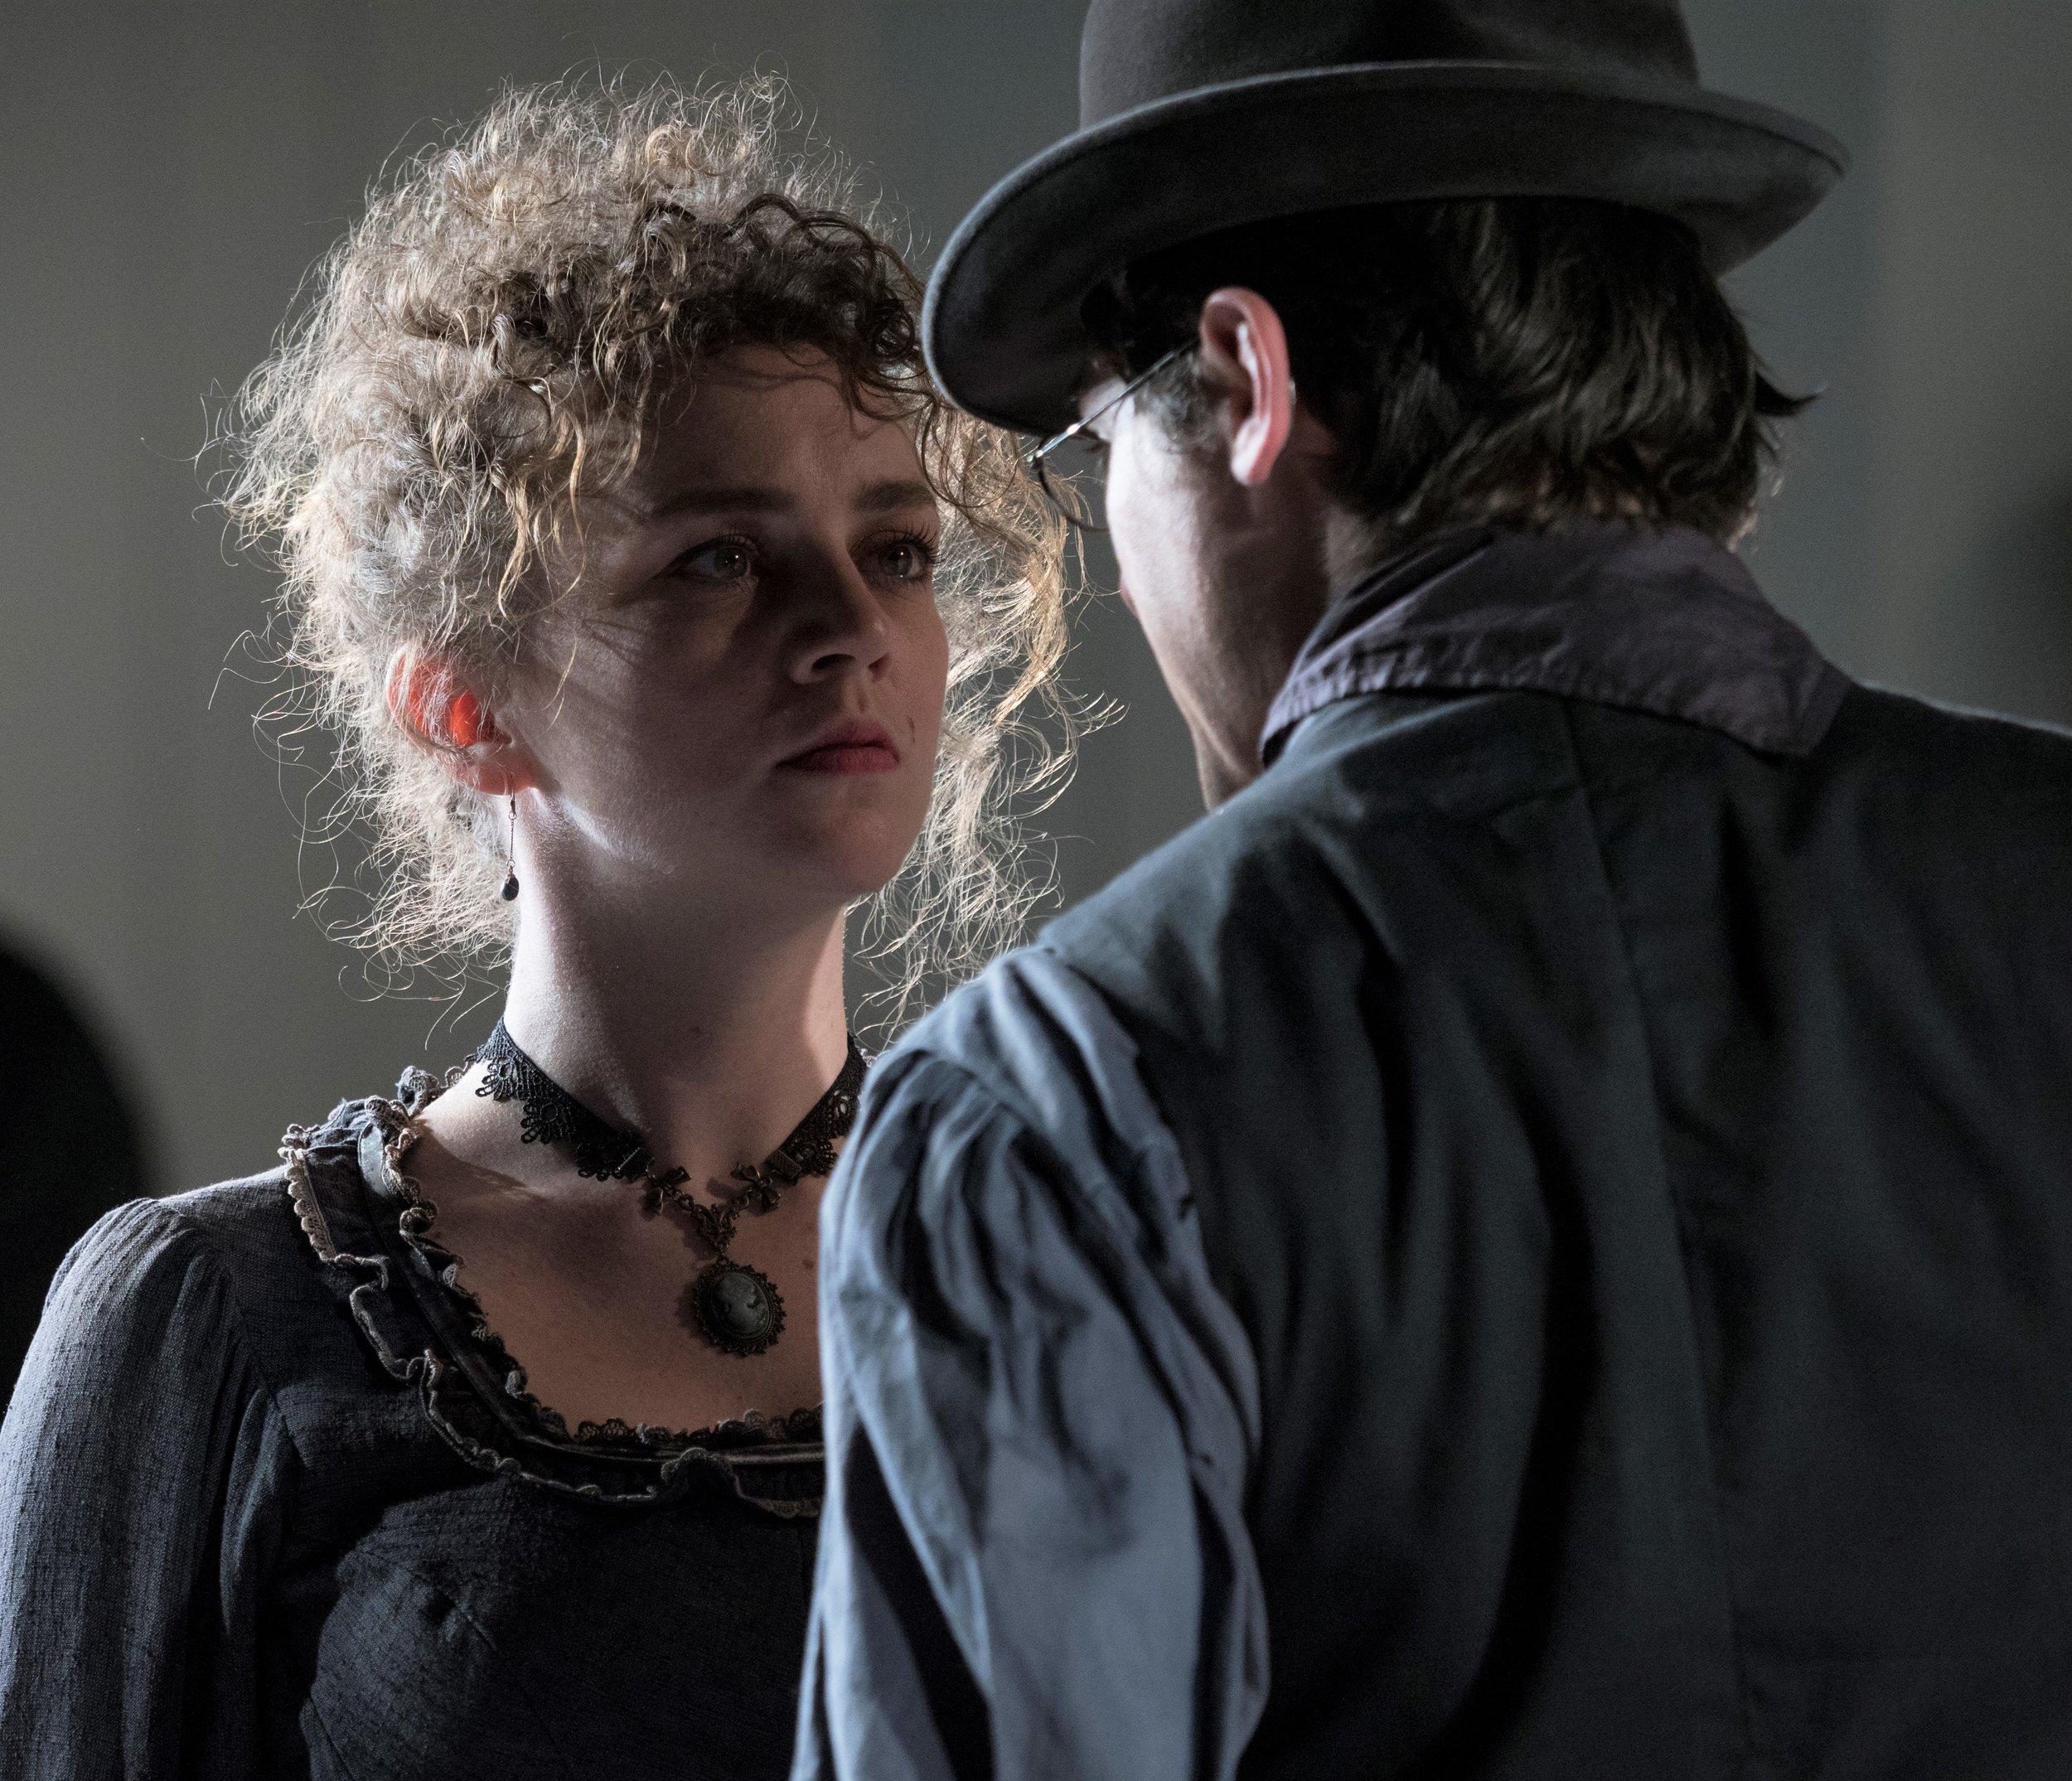 Britt Genelin (left) as Helen Ramirez and McCormick. Photographs by Pavel Antonov.